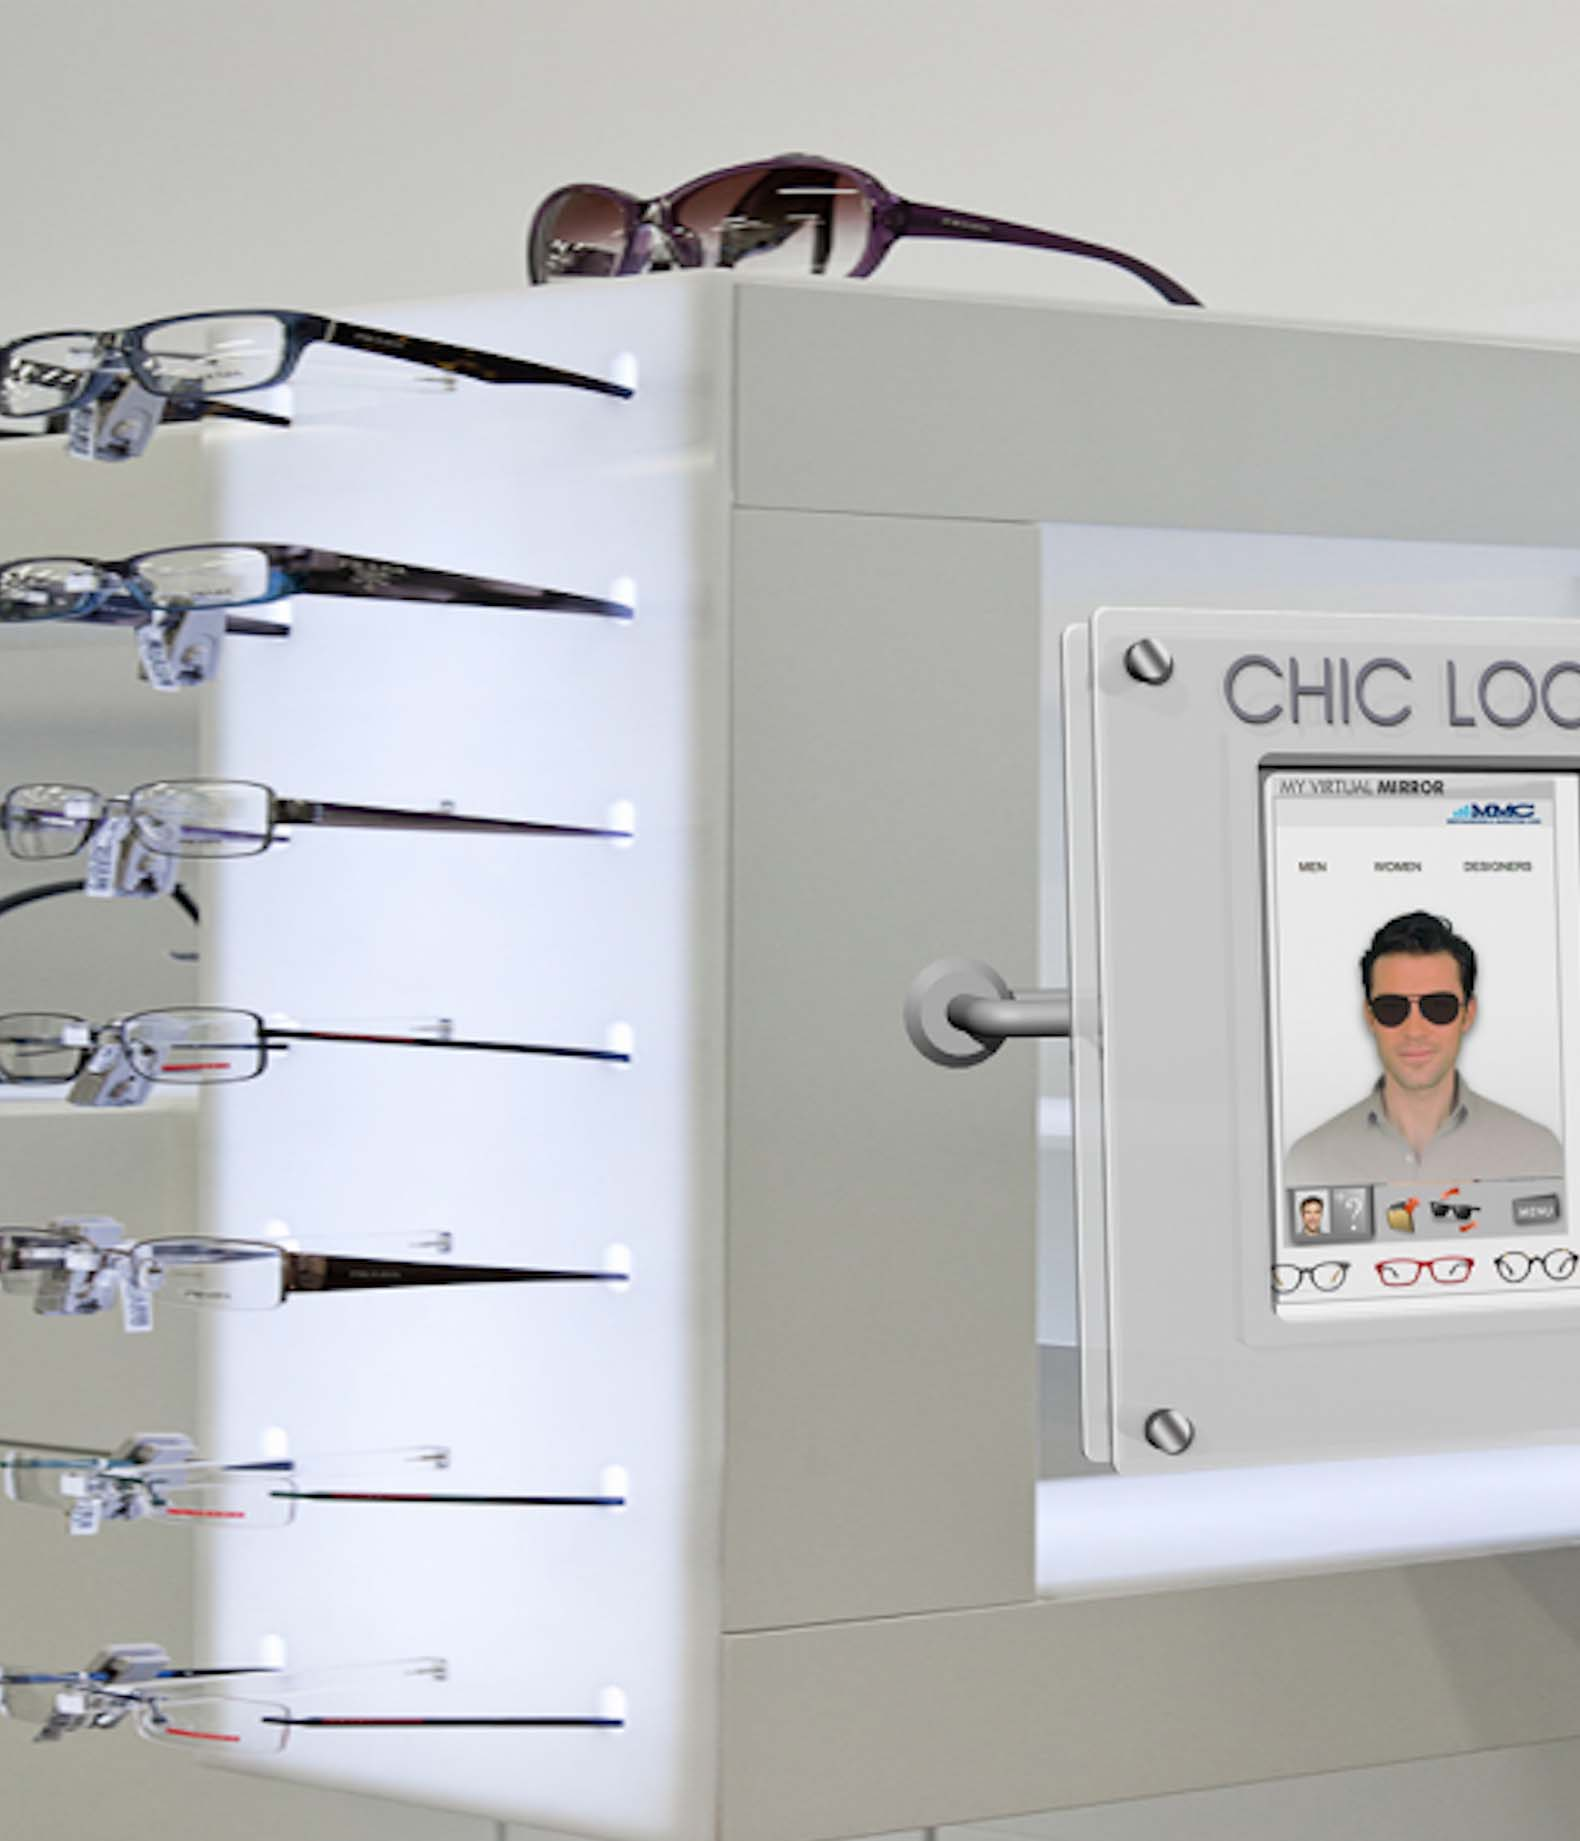 Product Merchandising Chic Look